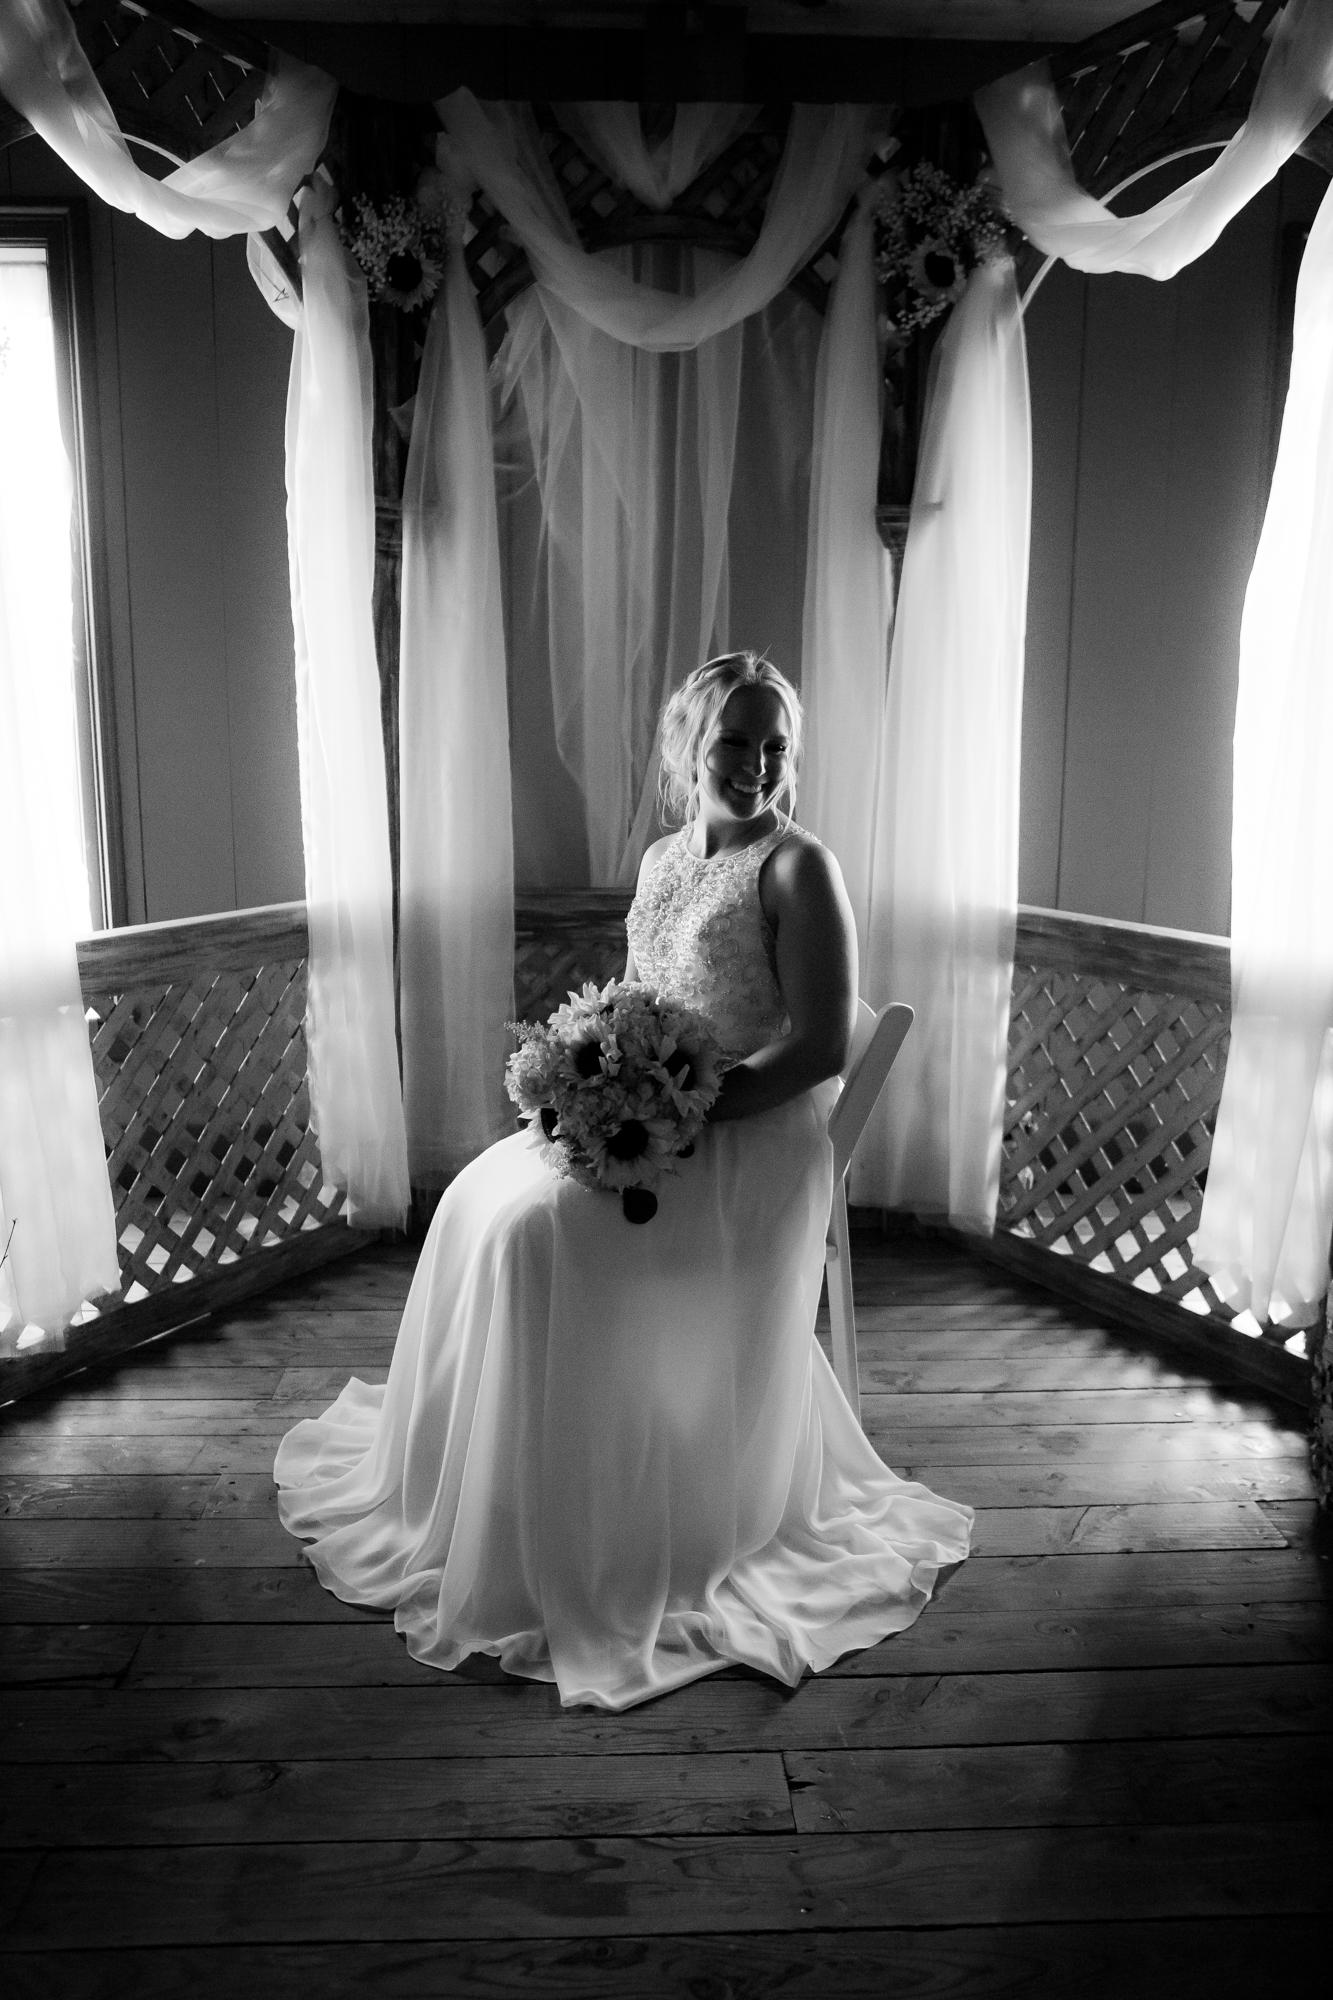 Wedding-Carriage-House-Oneonta-NY-0845.jpg